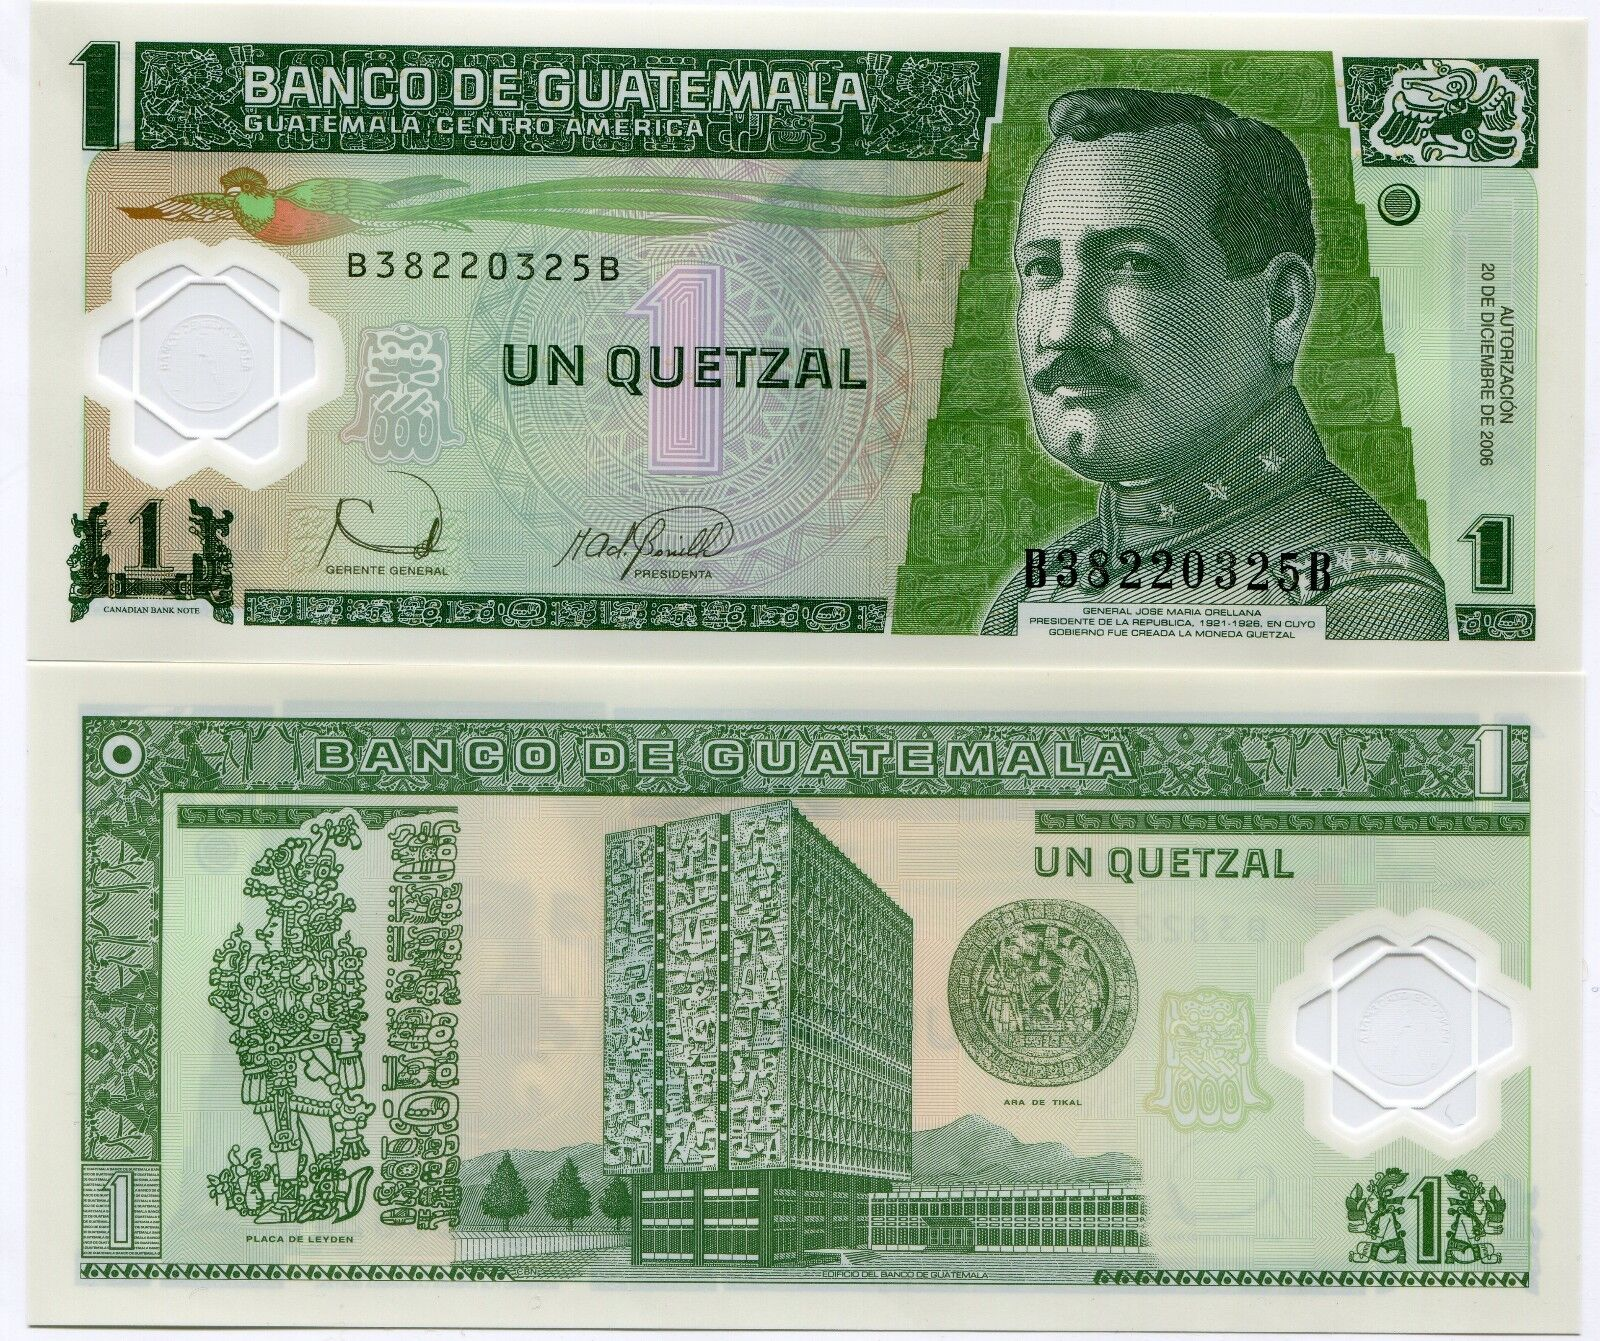 2006 P109 1 Quetzal Polymer Money Unc